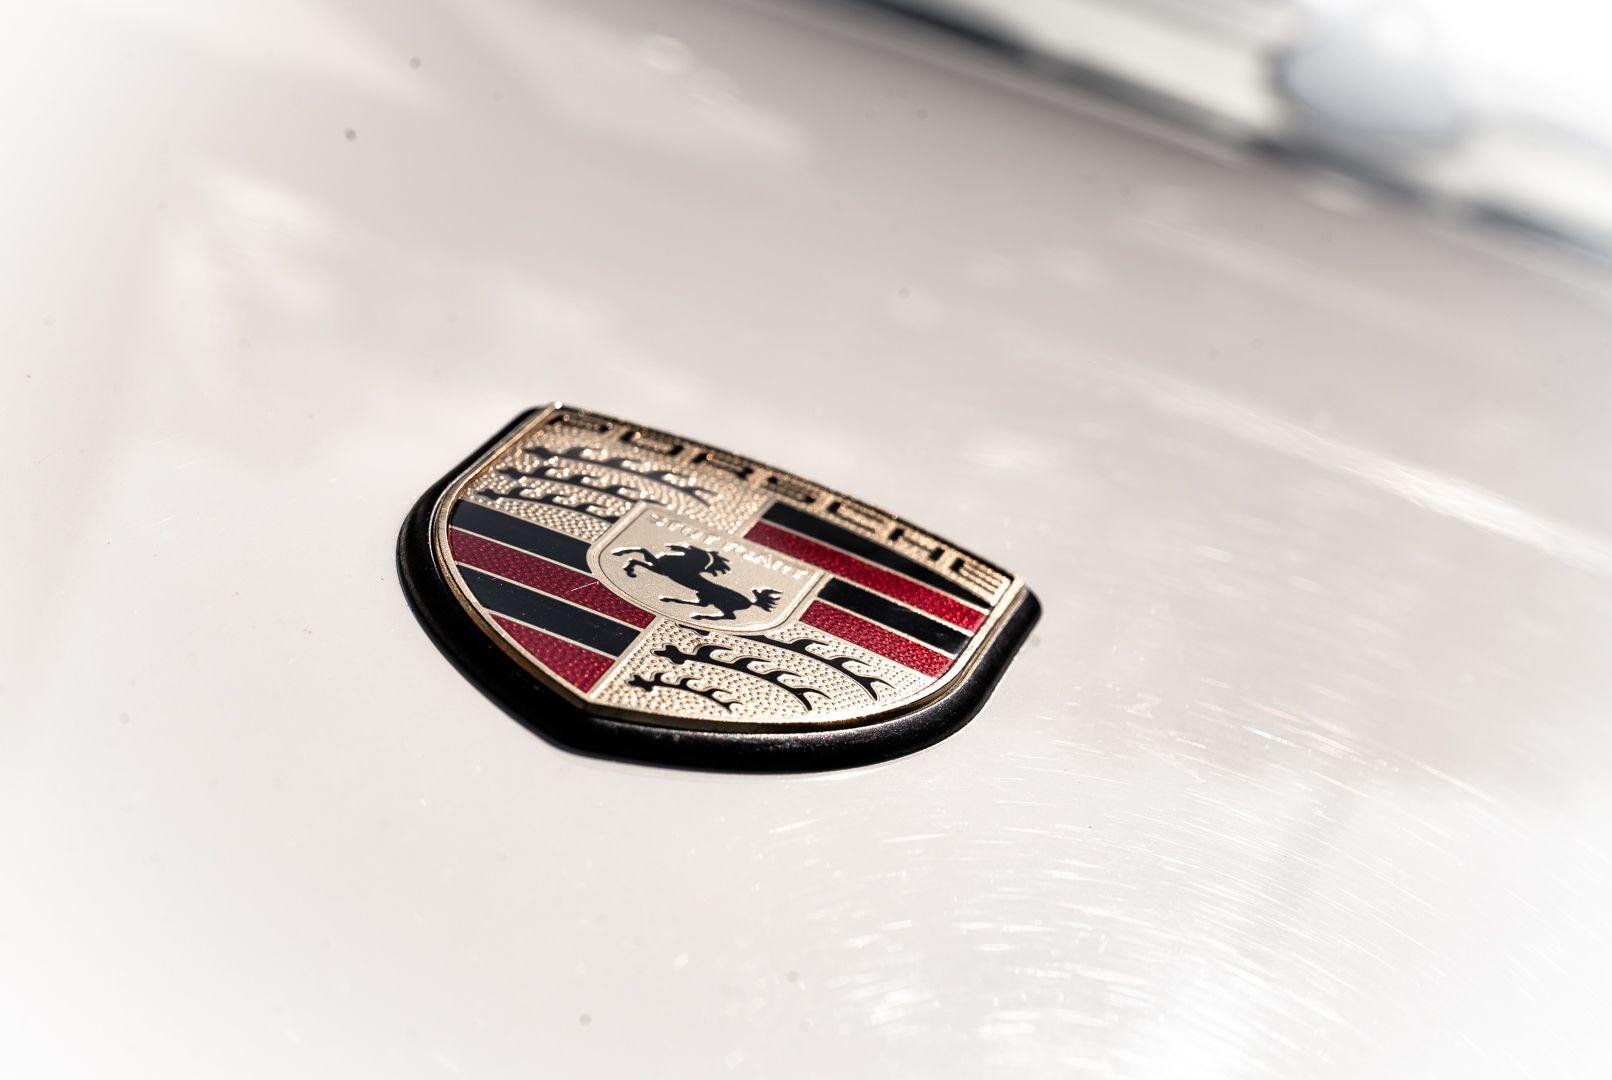 2011 PORSCHE 997 CARRERA GTS 60772